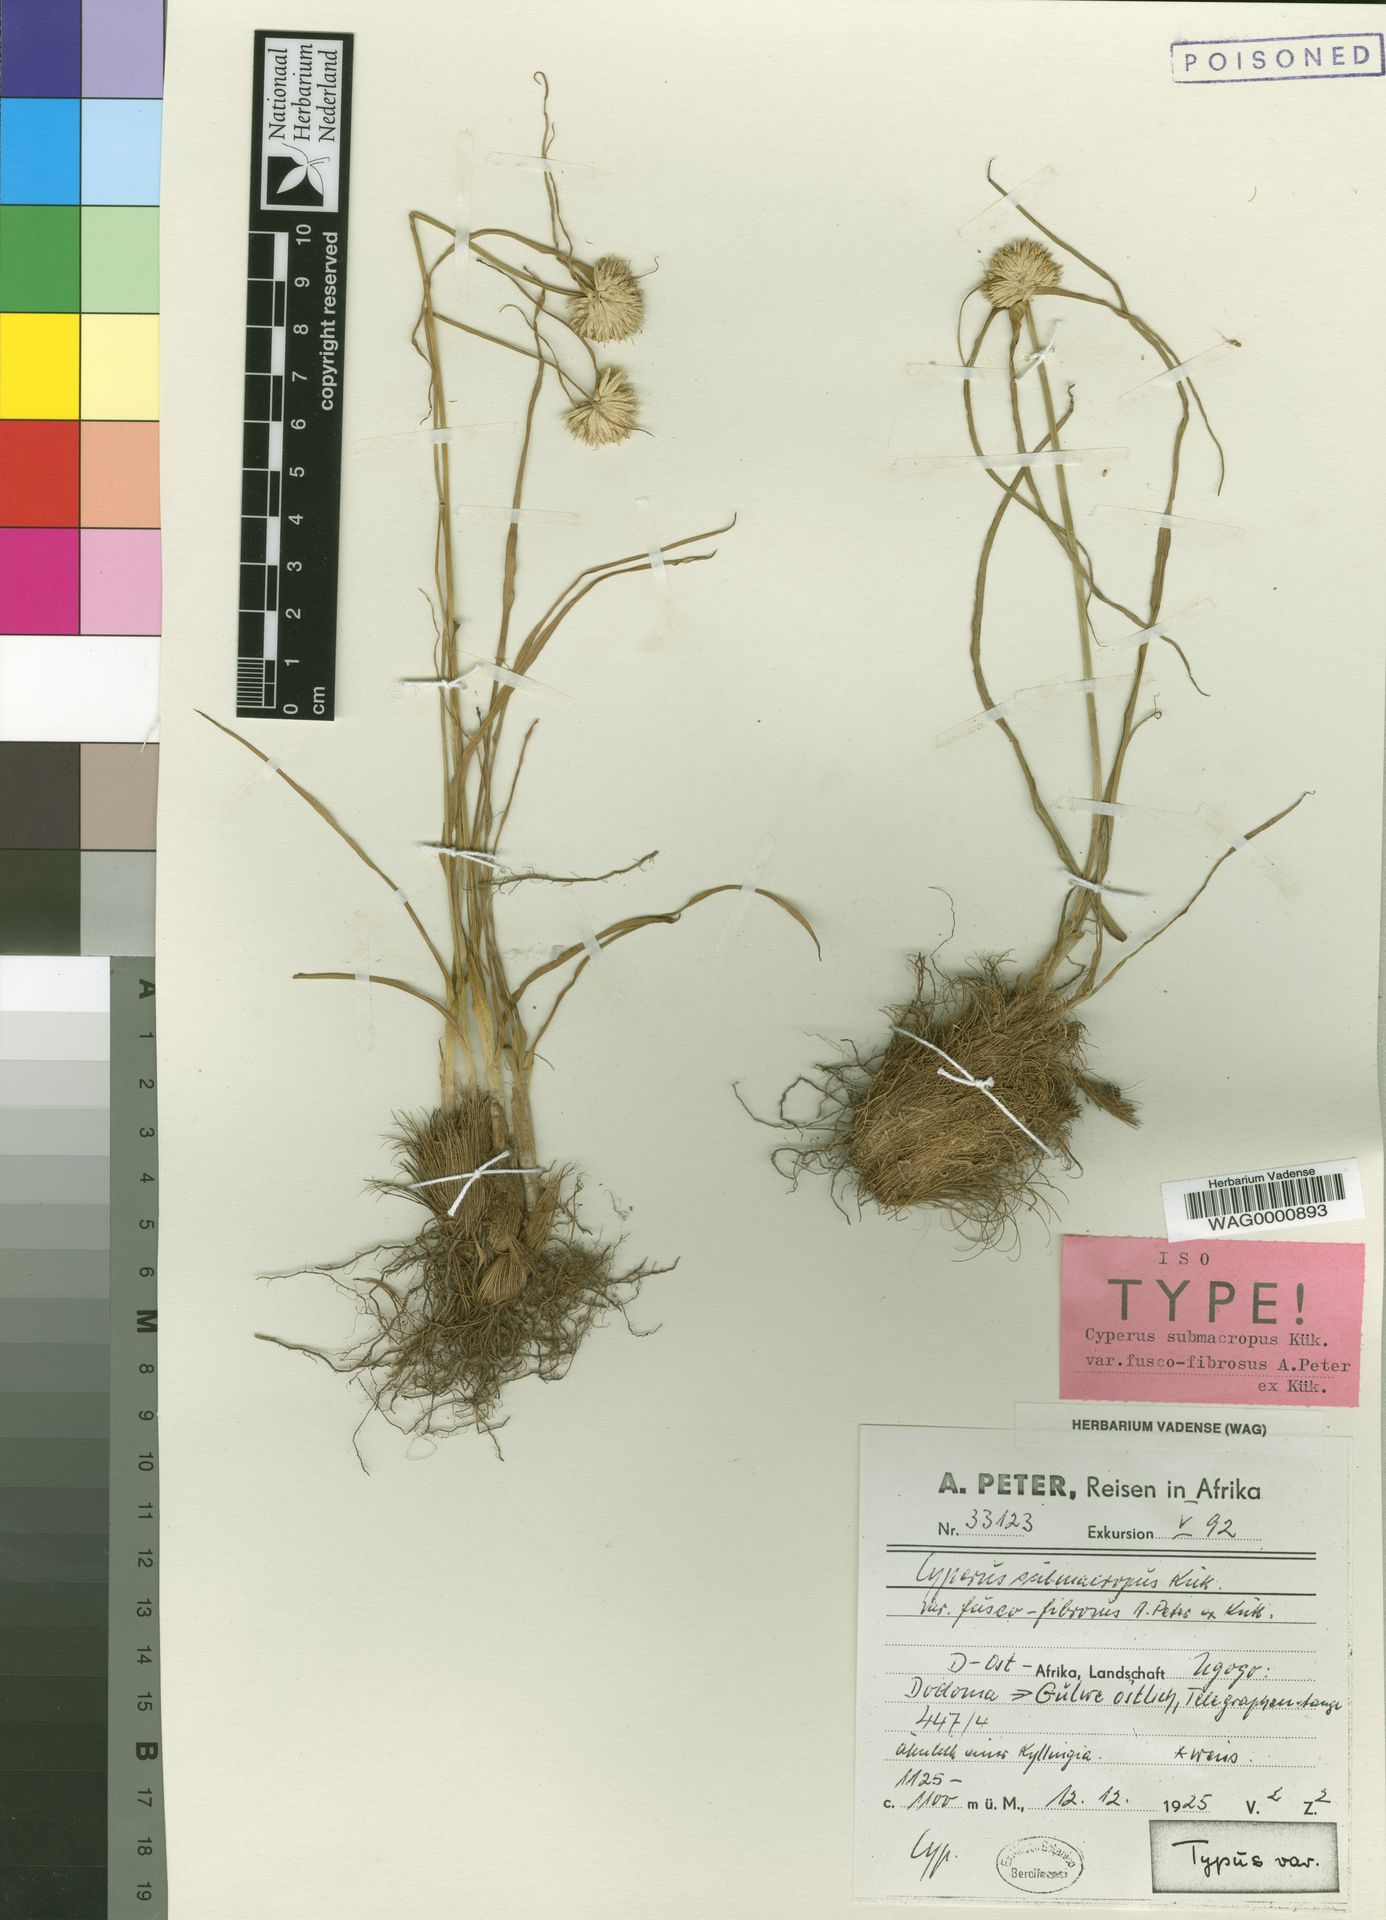 WAG.1765679 | Cyperus submacropus var. fusco-fibrosus Peter ex Kük.